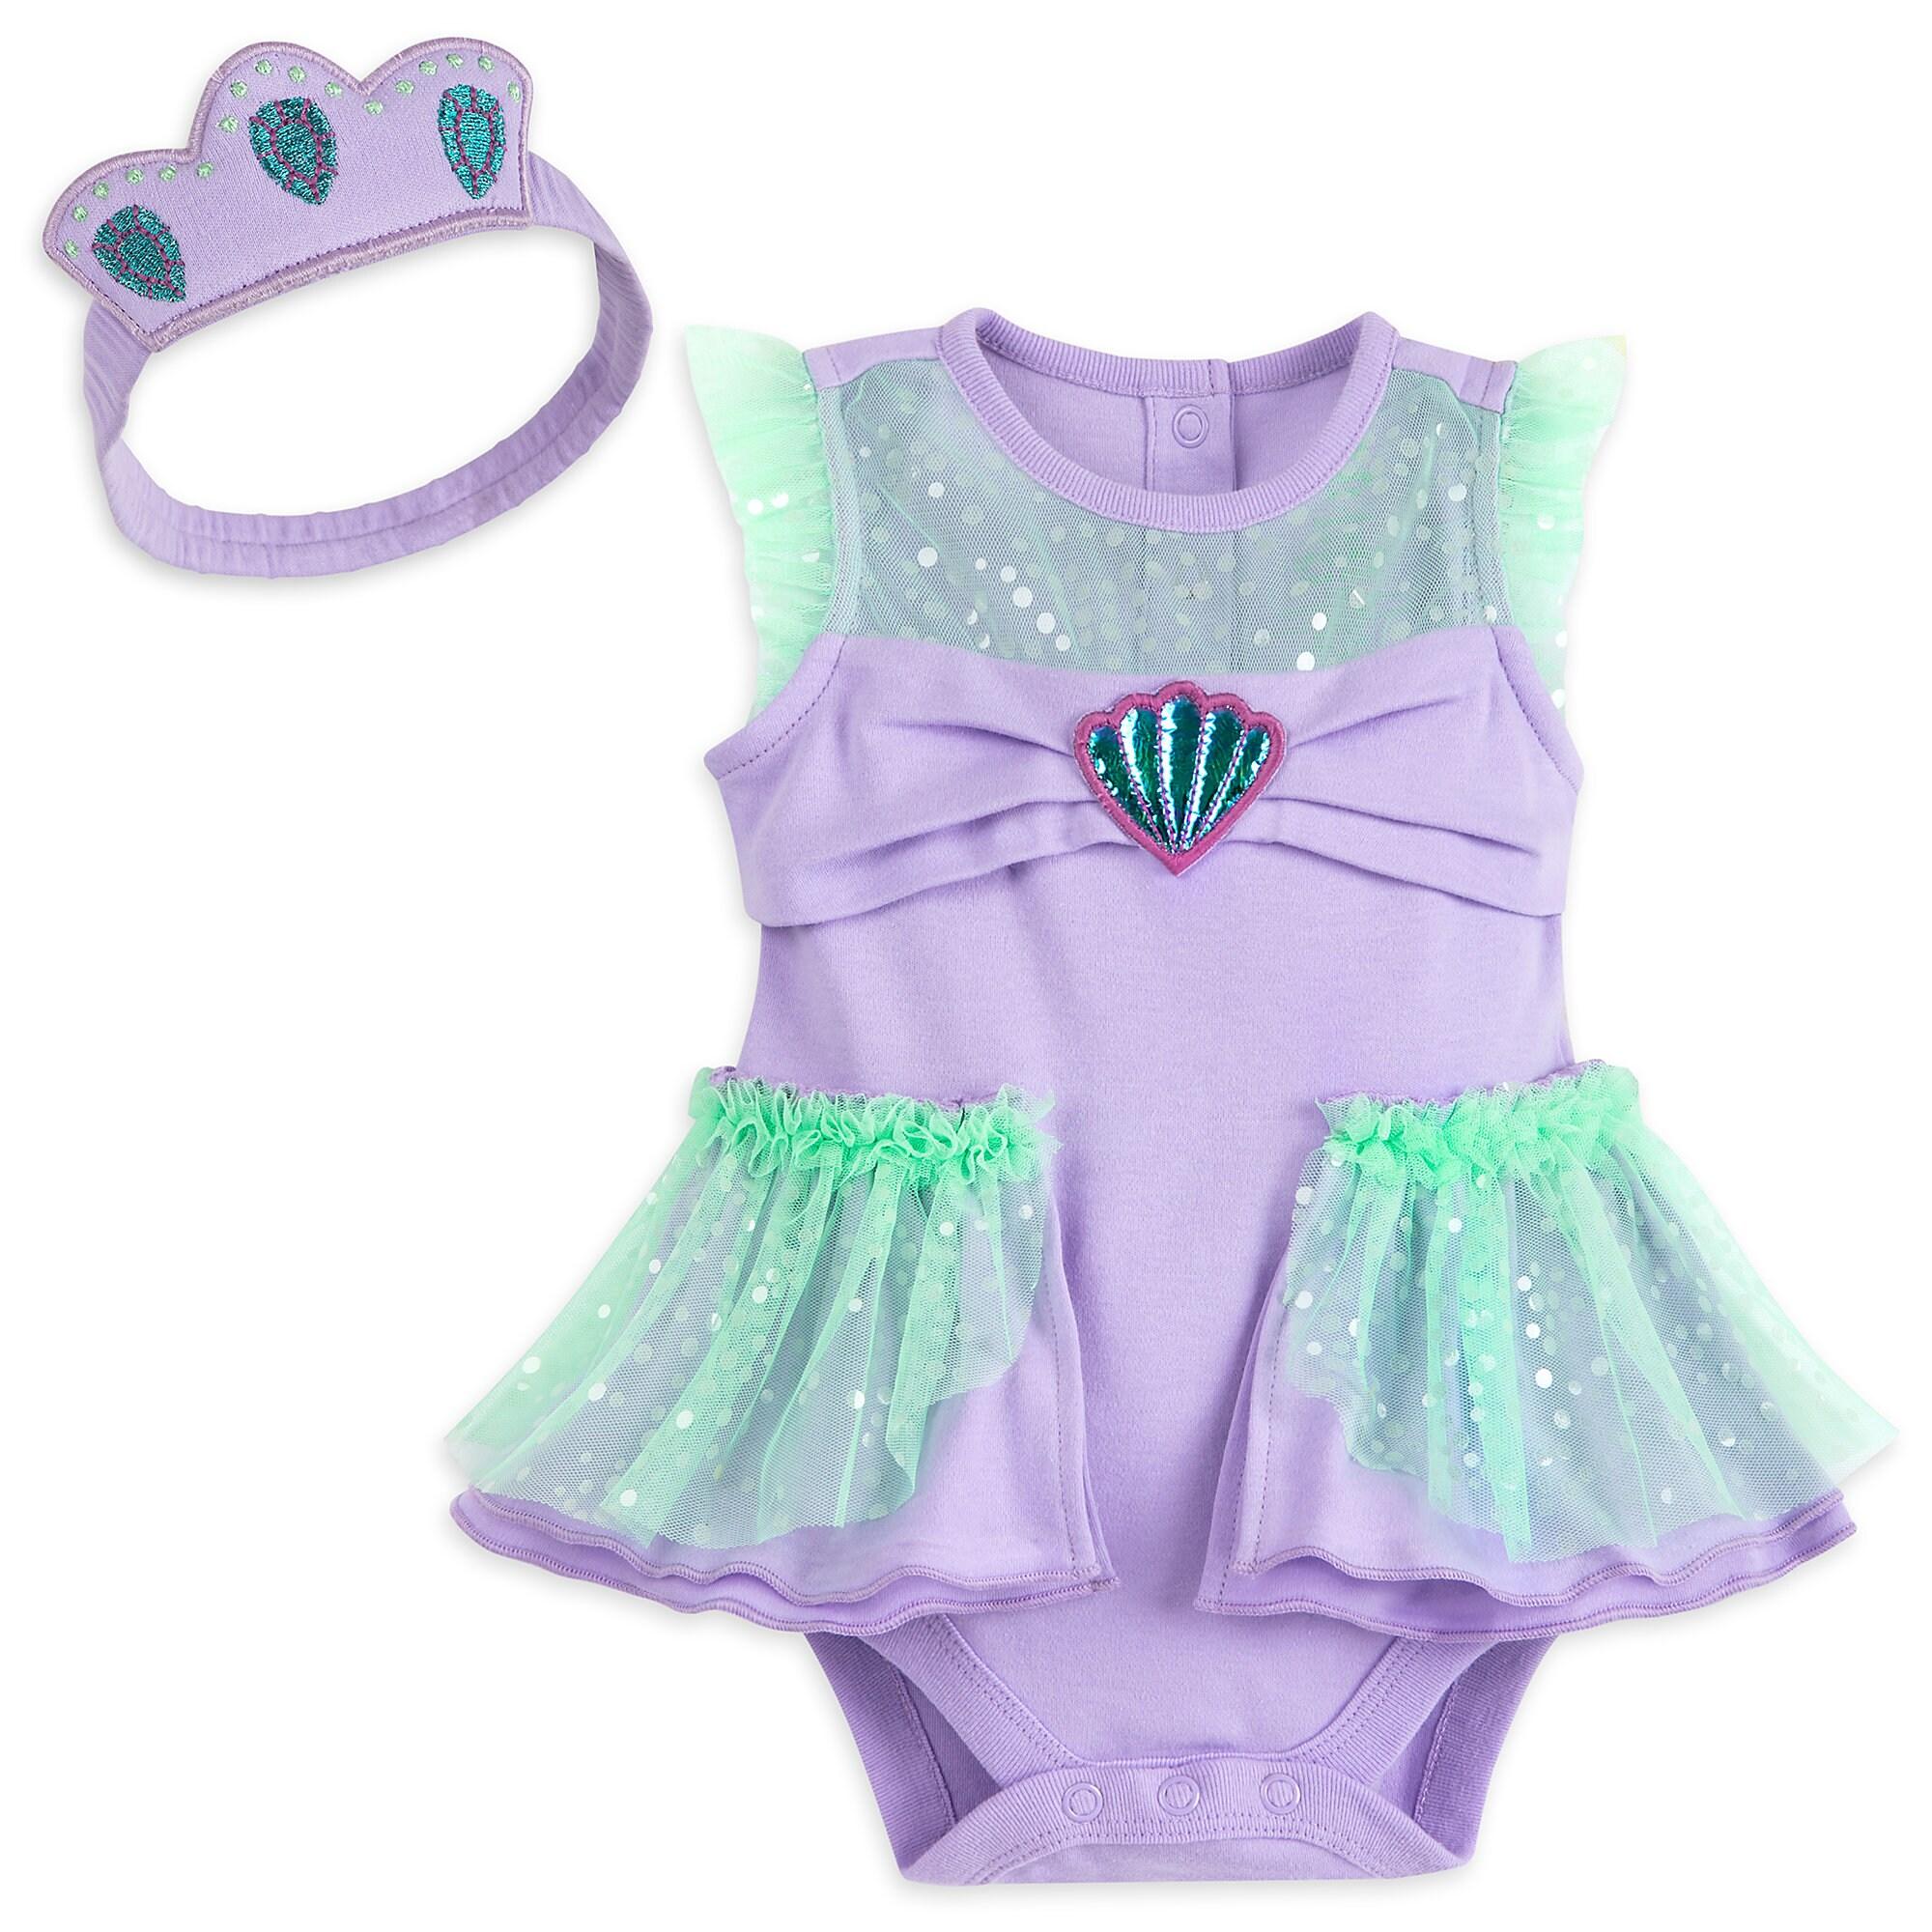 Ariel Costume Bodysuit for Baby